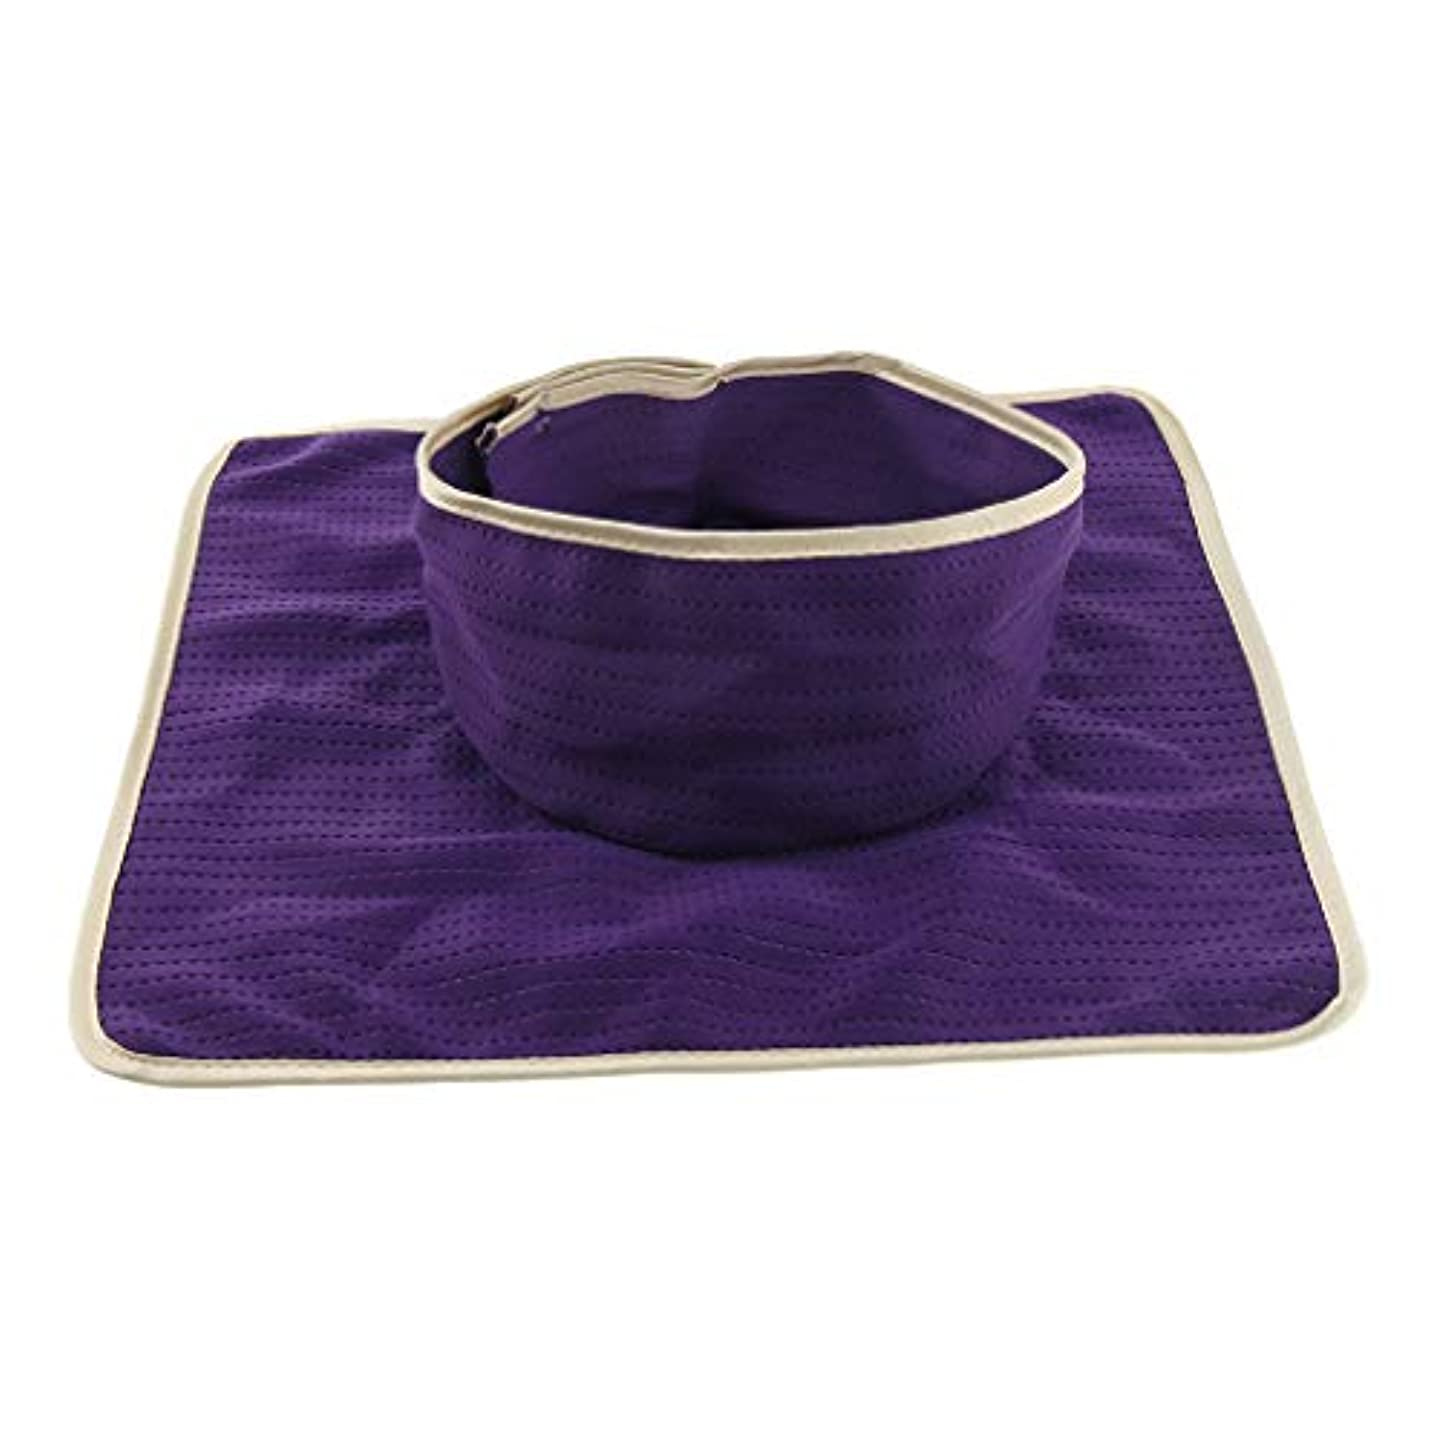 D DOLITY マッサージ ベッド テーブル ヘッドパッド 頭の穴付 再使用可能 約35×35cm 全3色 - 紫